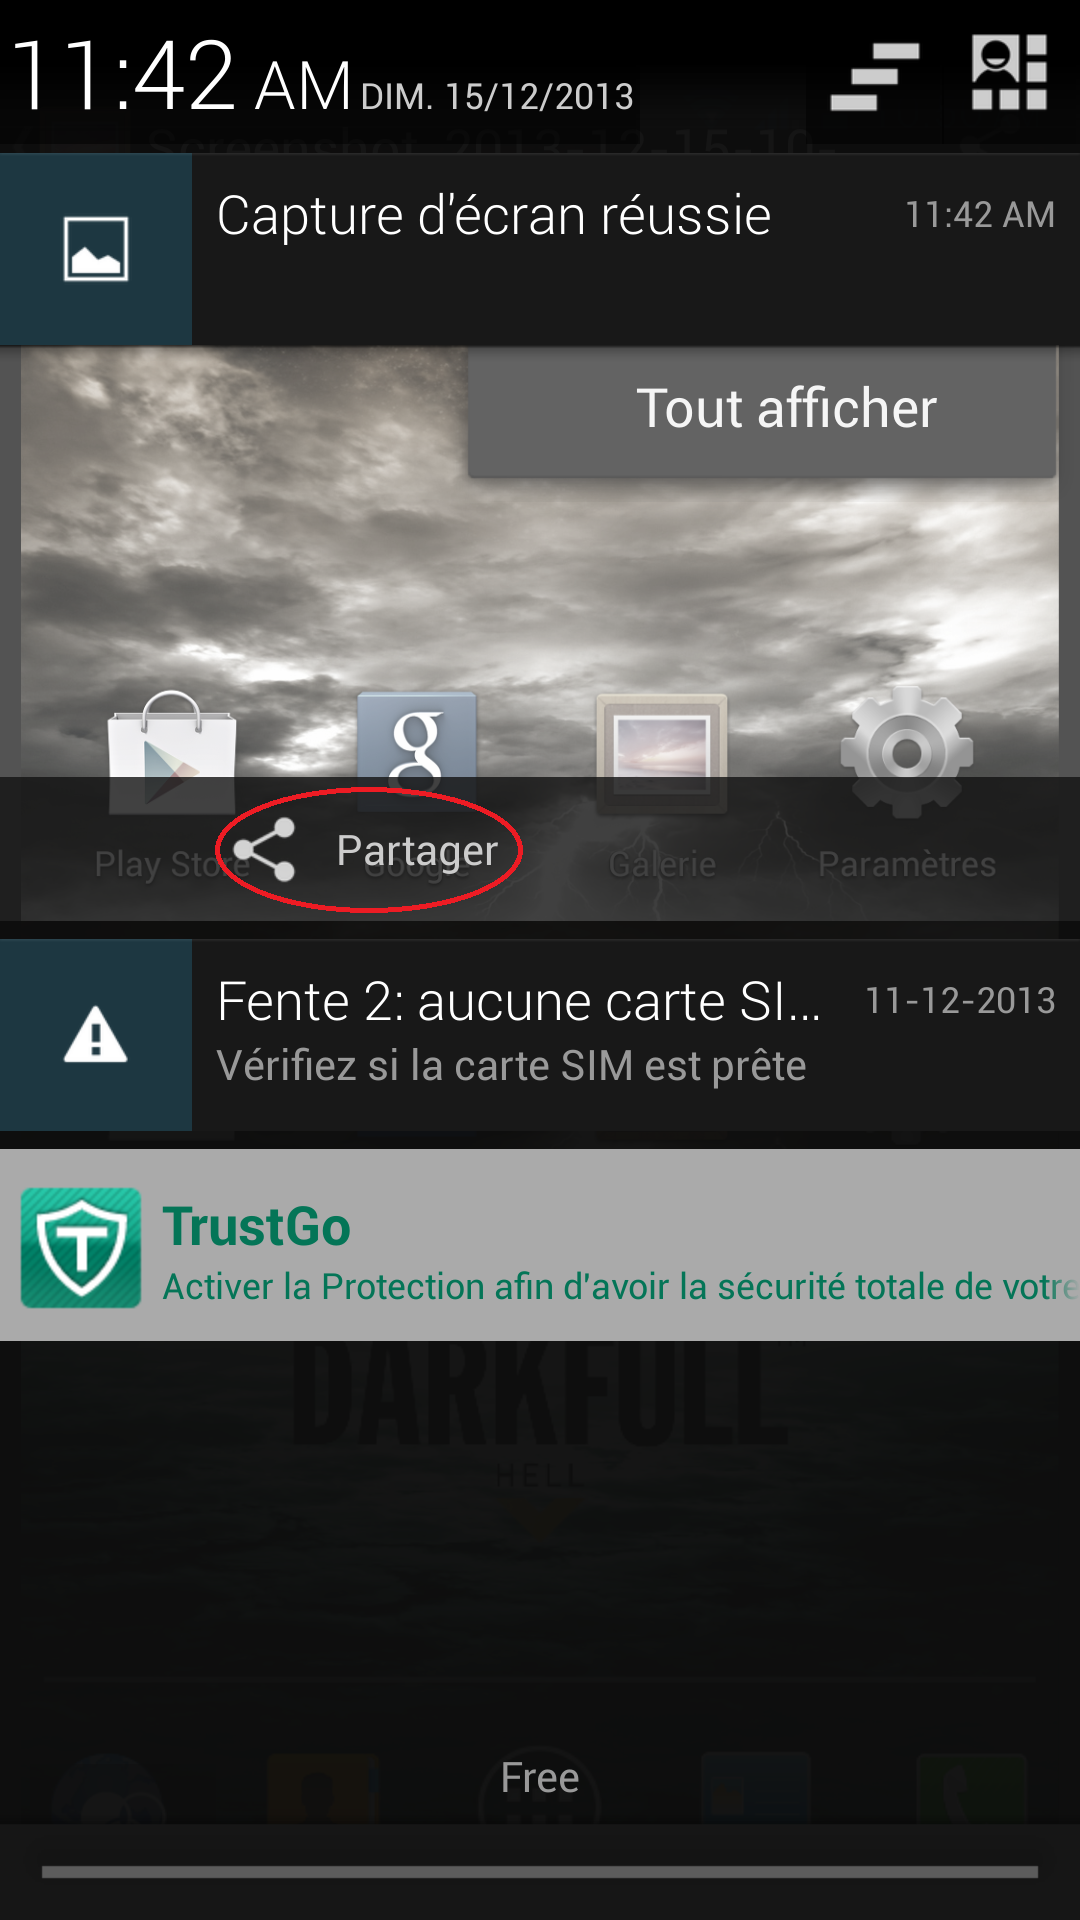 Screenshot_2013-12-15-11-42-04